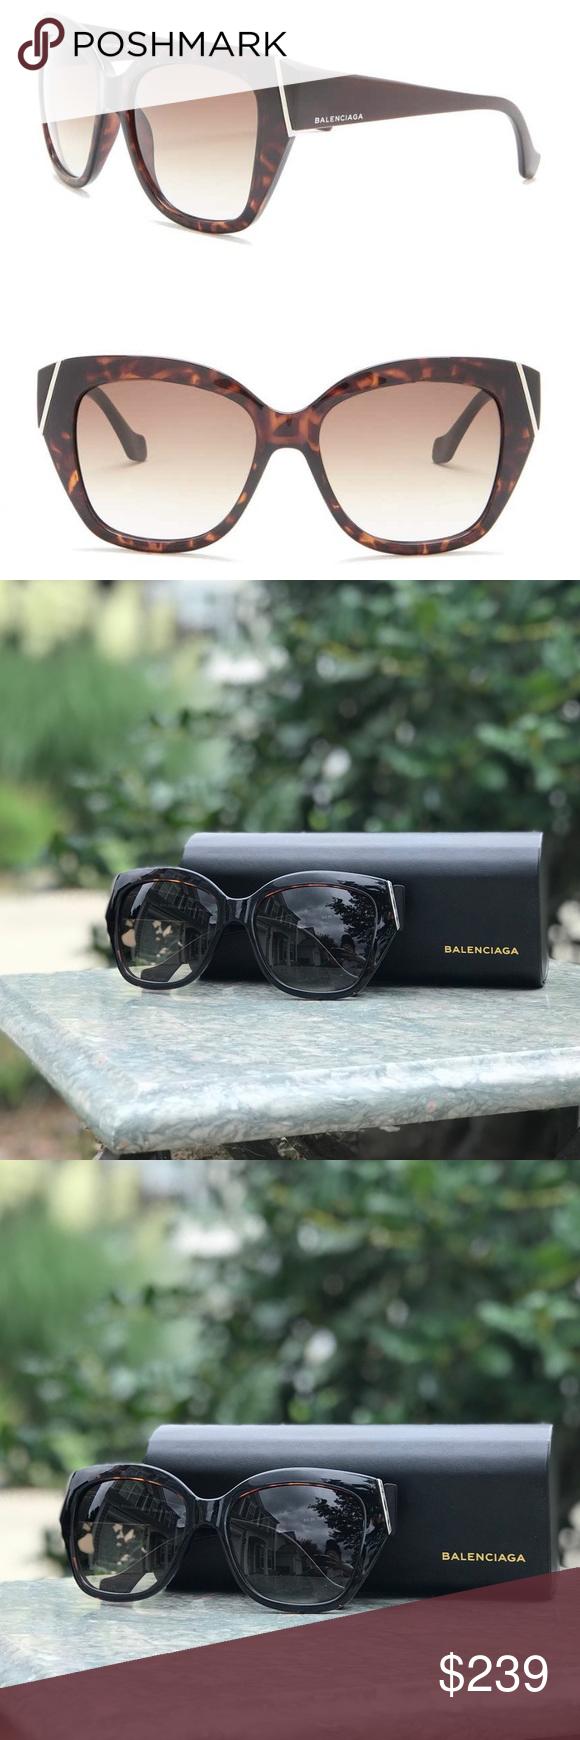 NWOT • Balenciaga Oversized 57mm Sonnenbrille Balenciaga Oversized 57mm Sonnenbrille …